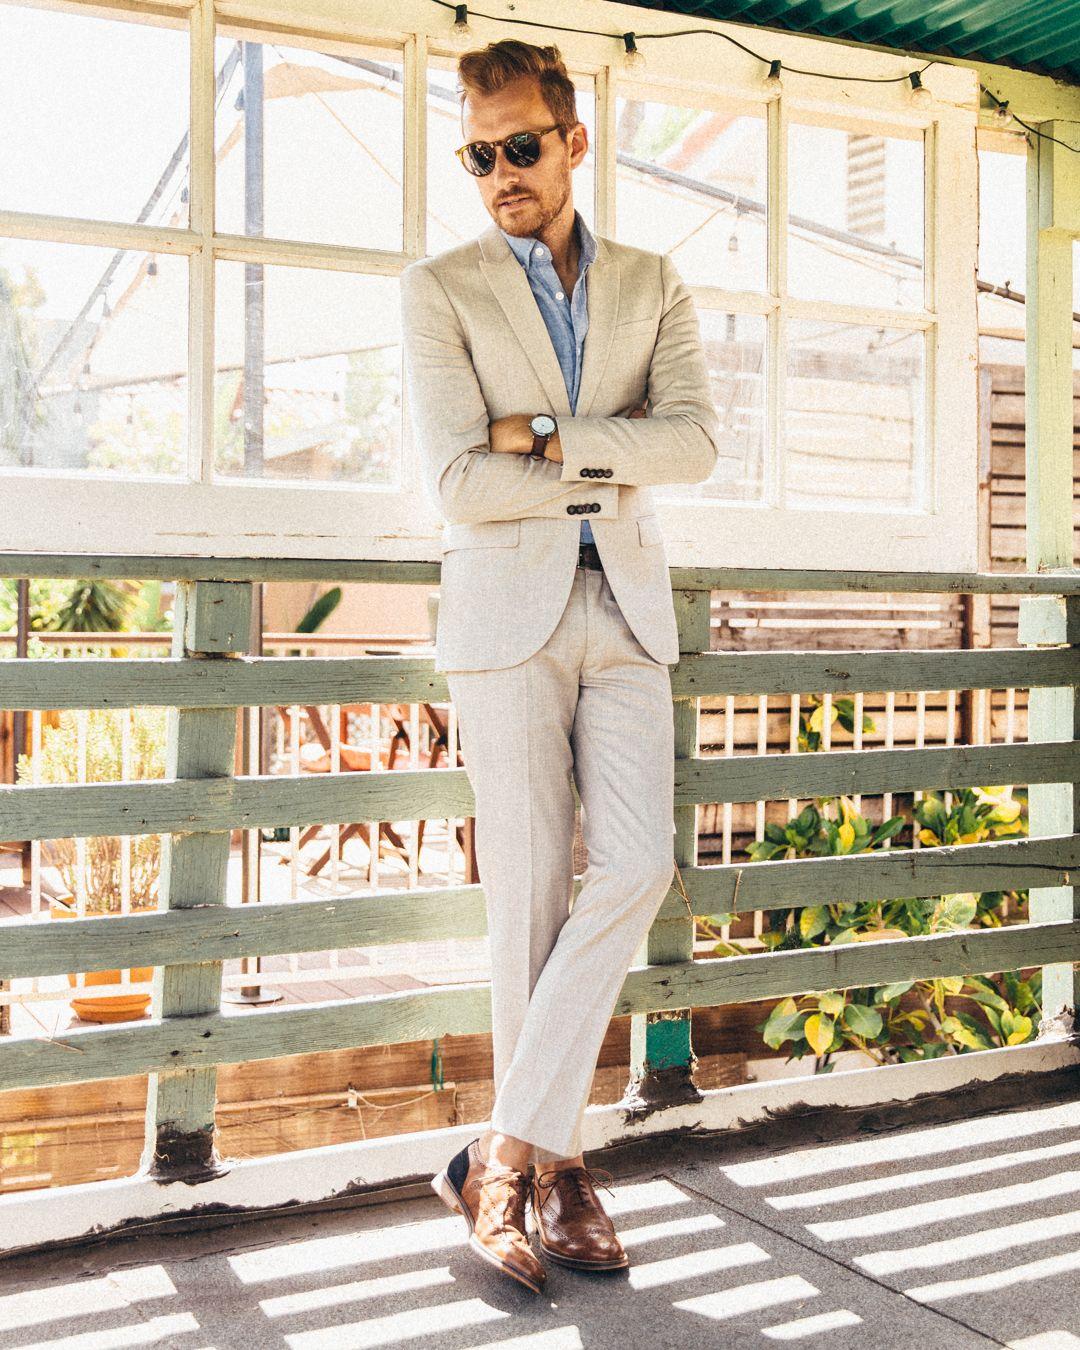 Stayclassic Tuxedo For Men Summer Suits Men Mens Style Looks